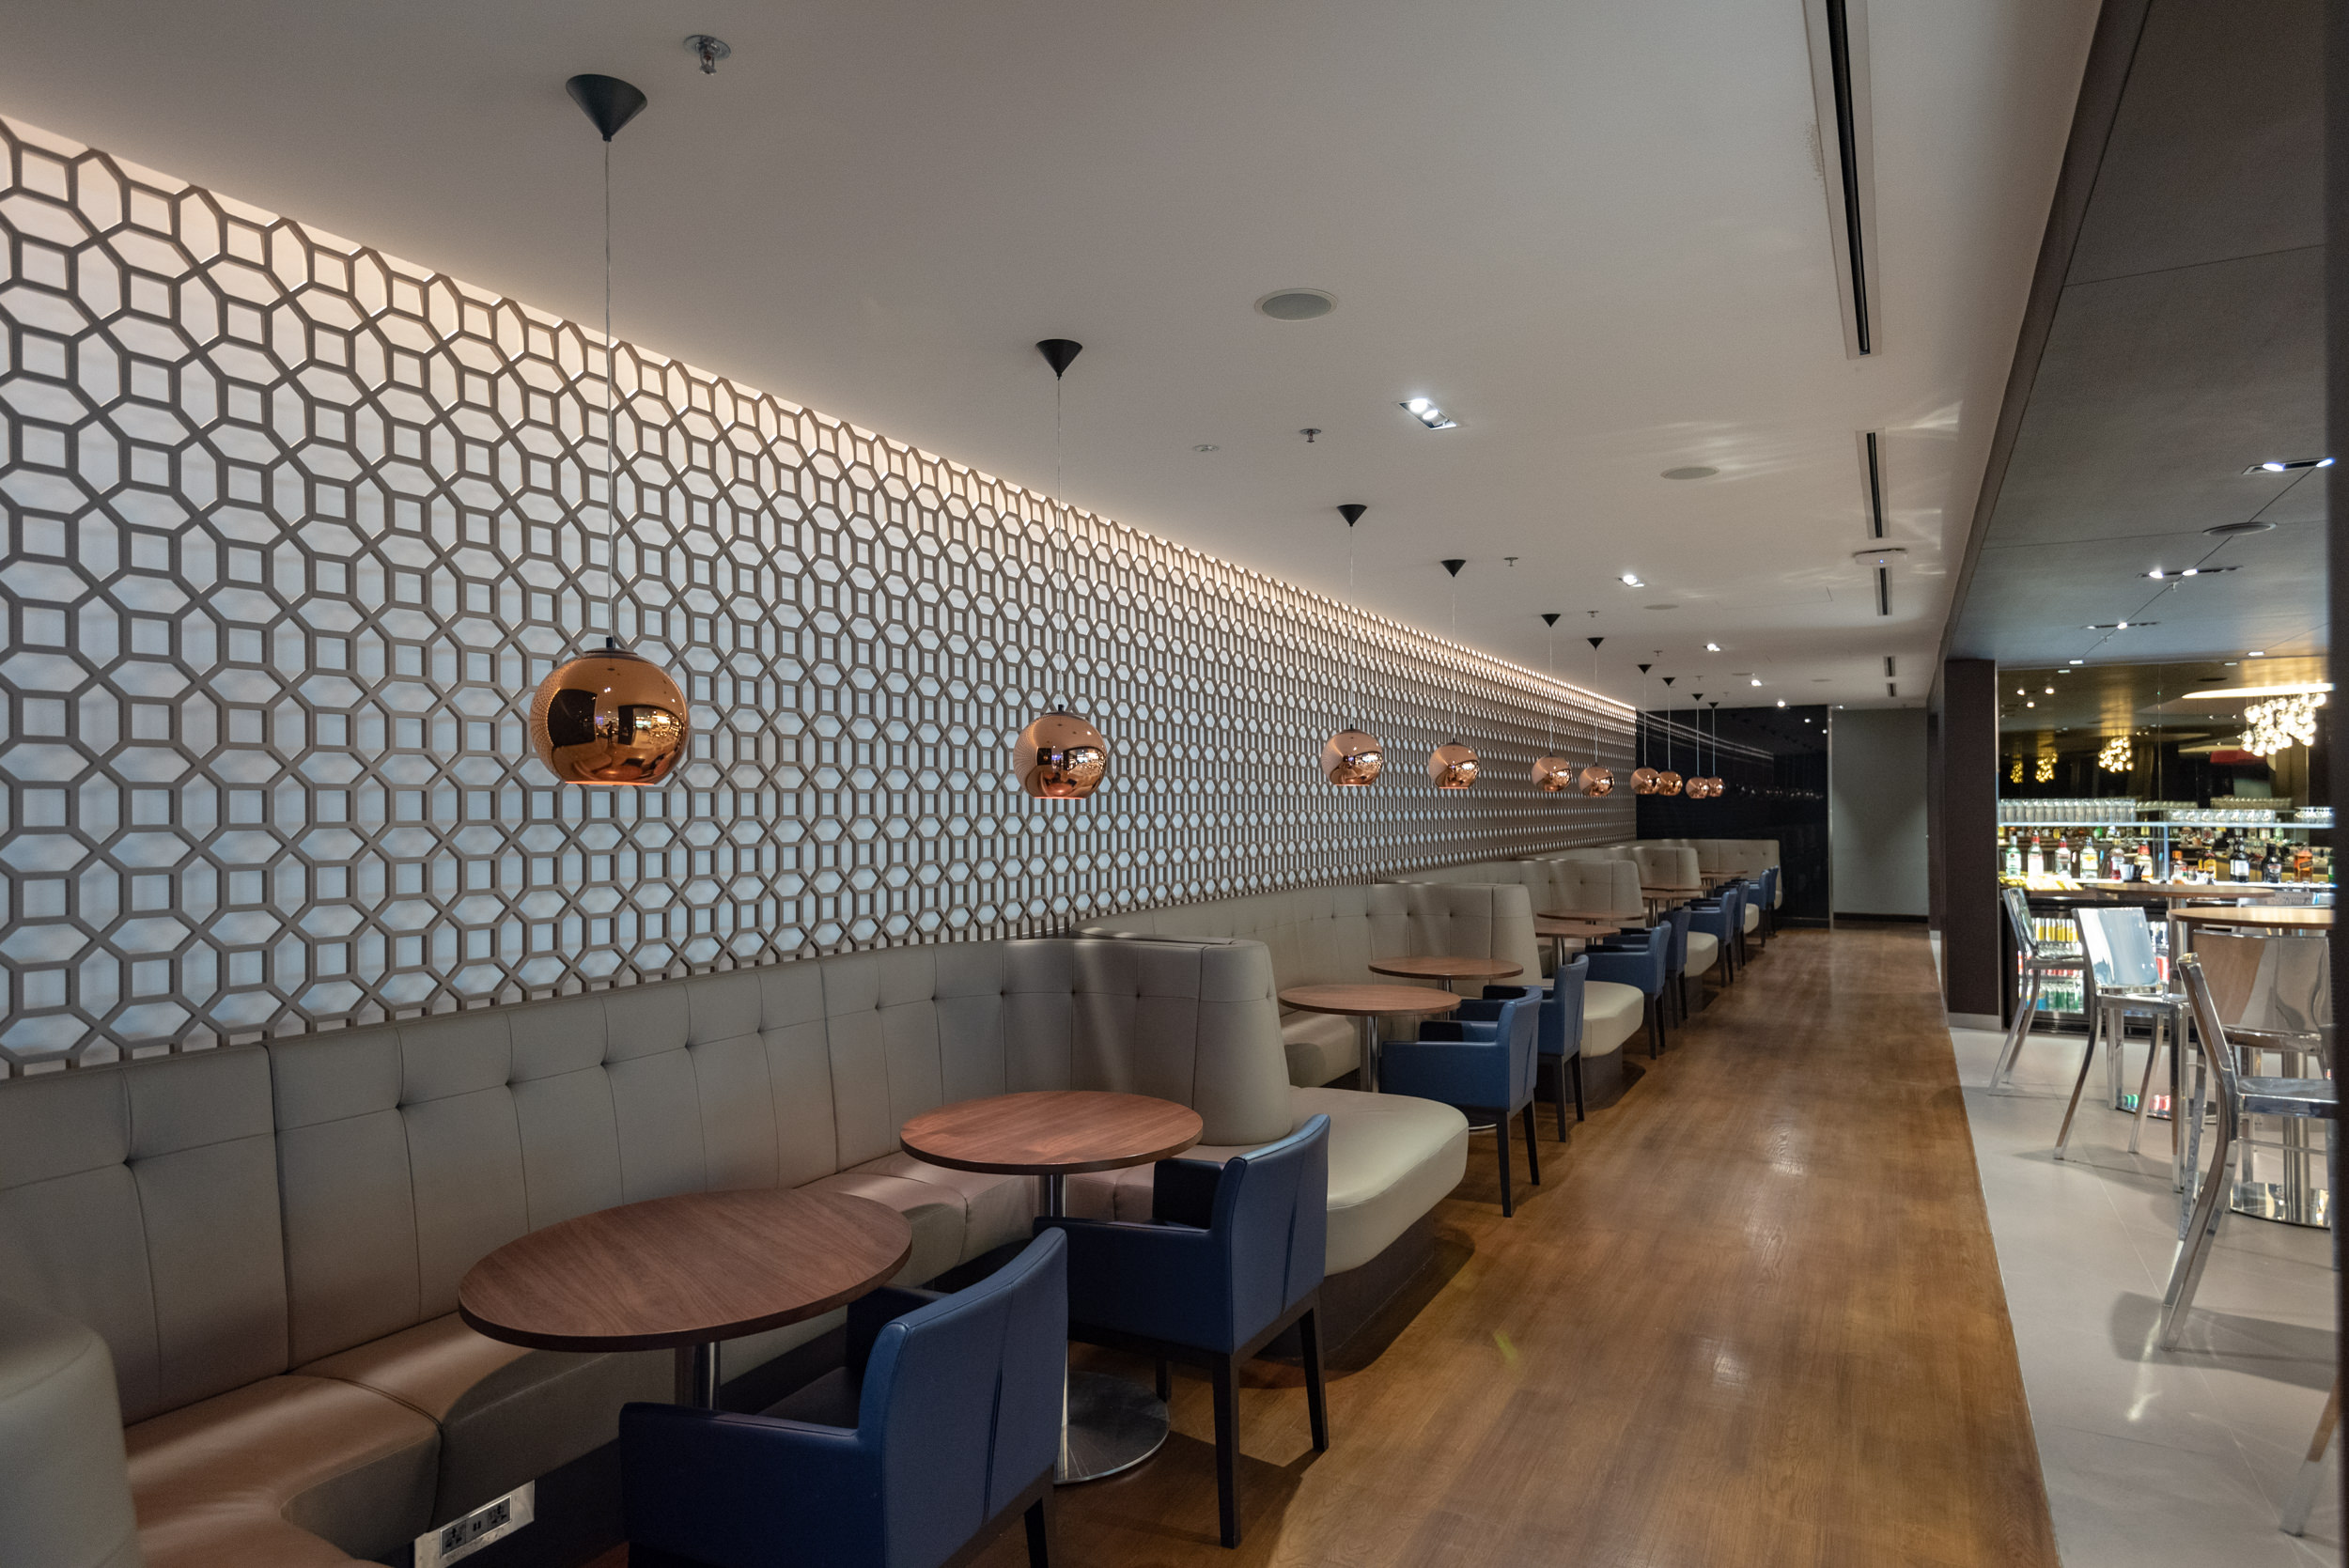 Plush Seating Area  British Airways Lounge and Concorde Bar - Singapore Changi Airport (SIN)